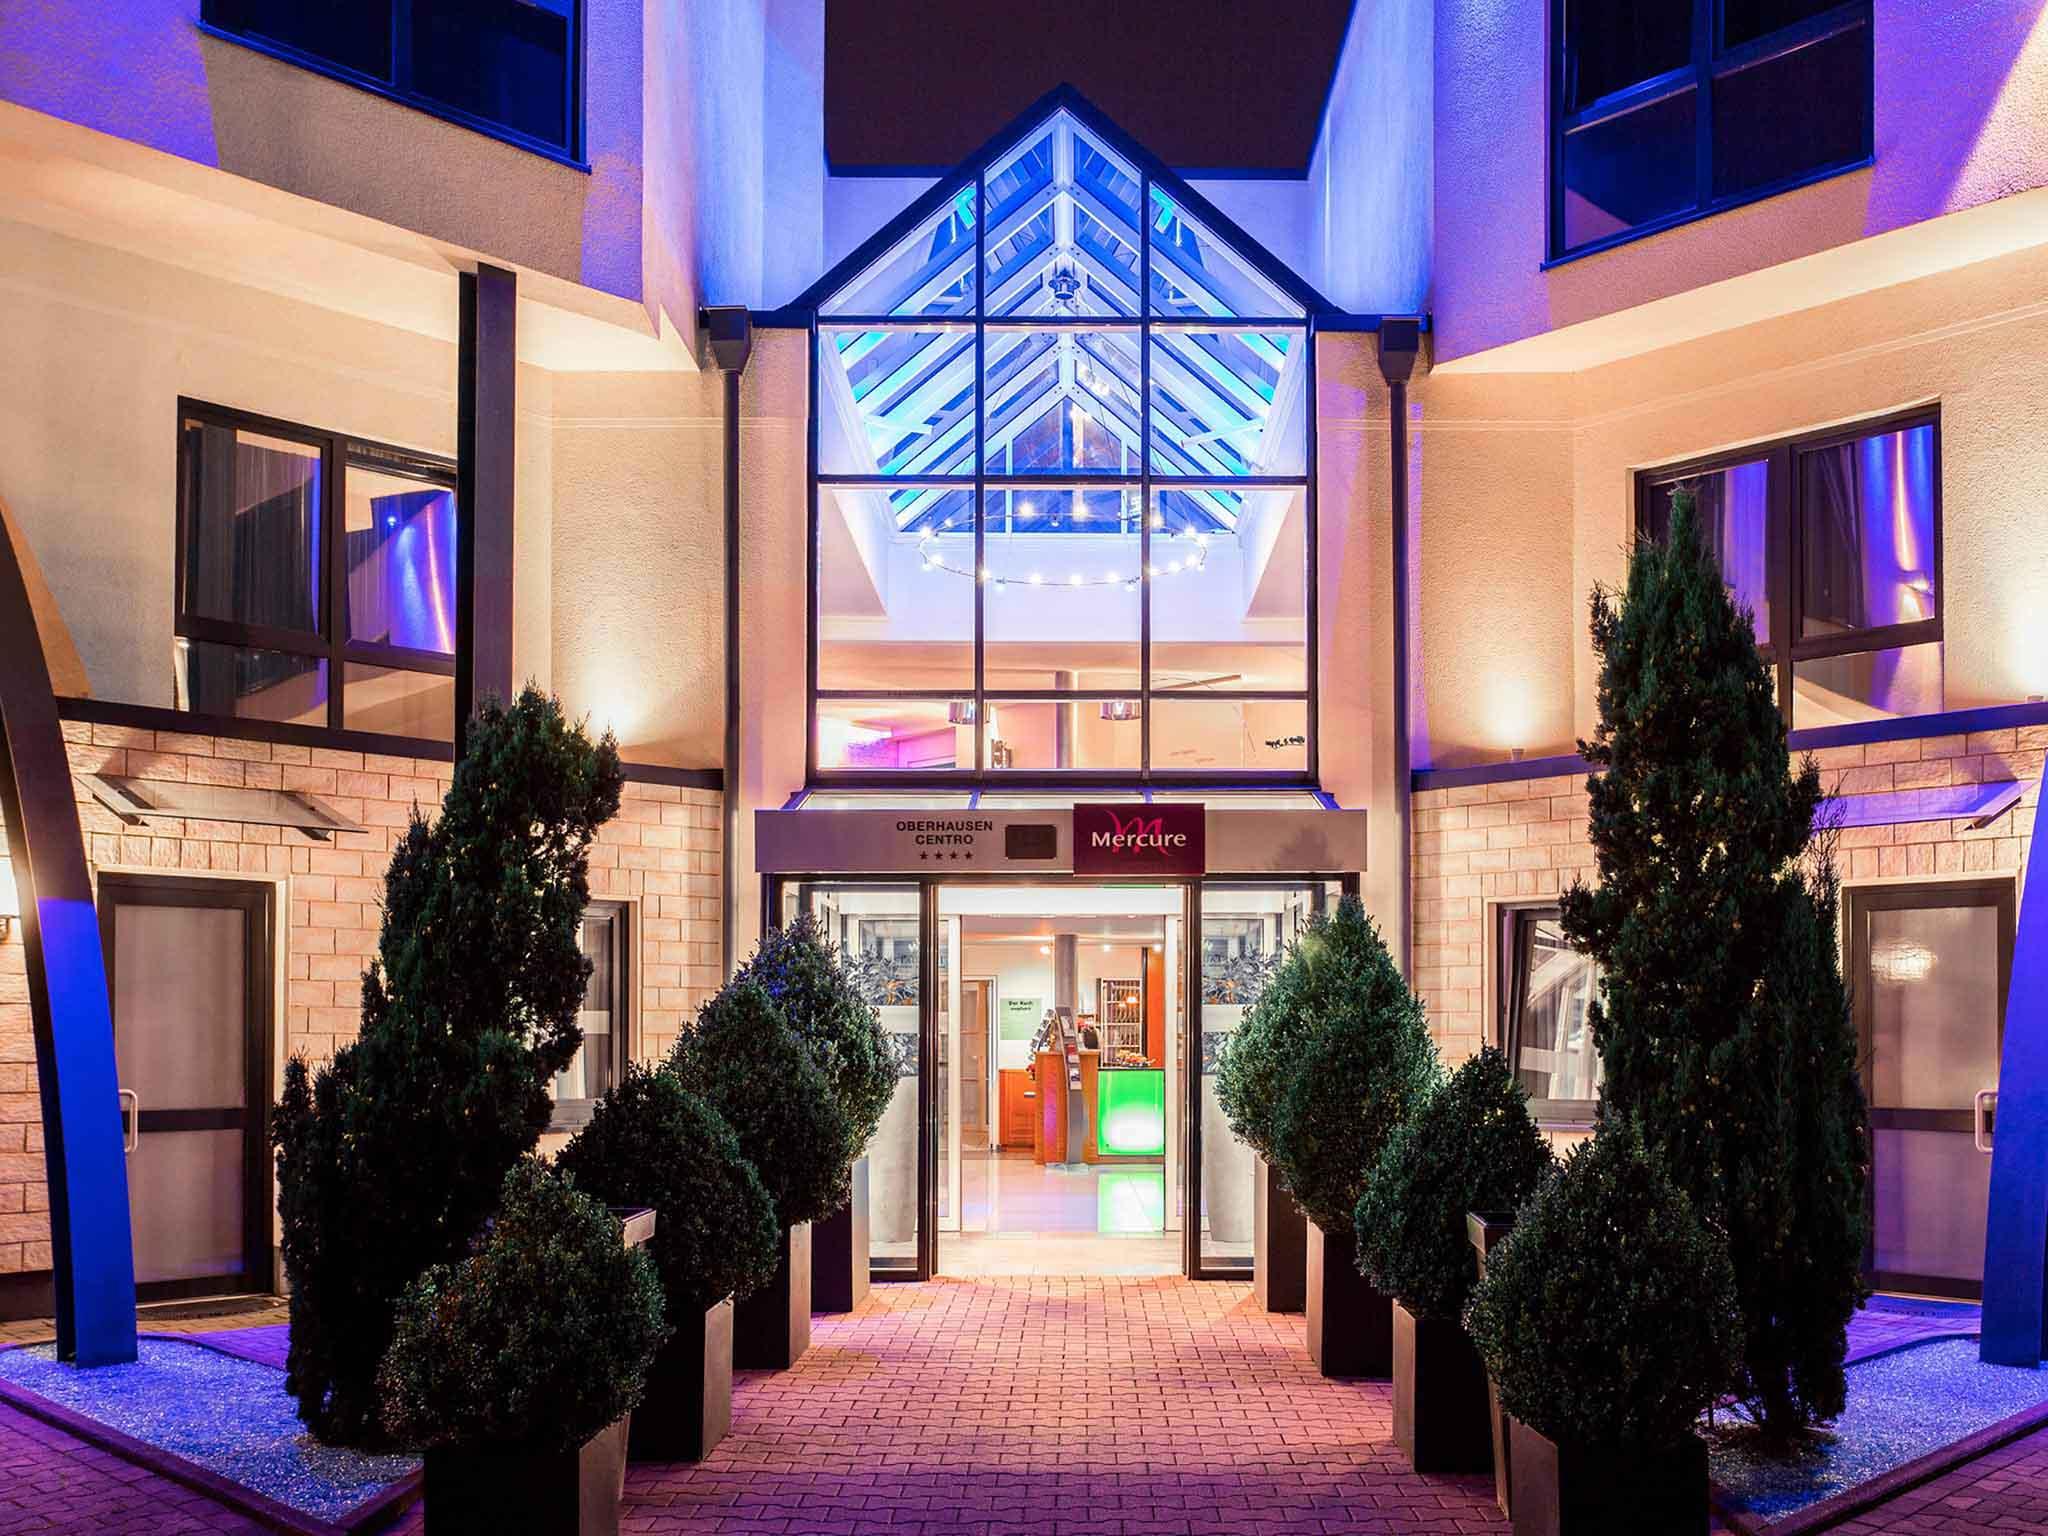 Hôtel - Mercure Hotel am Centro Oberhausen